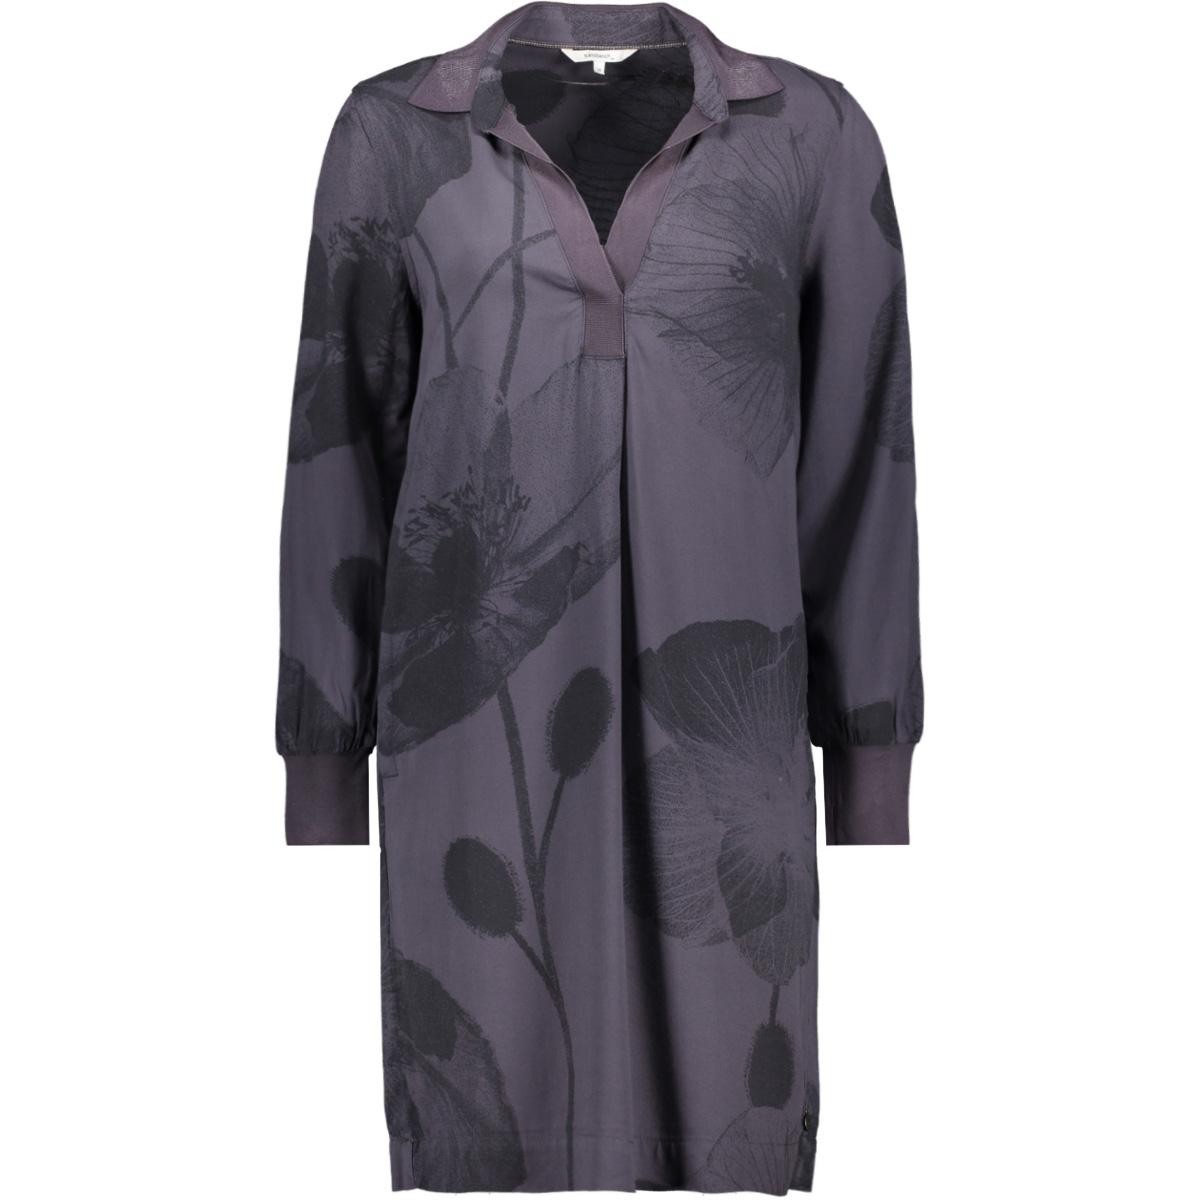 jurk met bloemenprint 23001665 sandwich jurk 80027